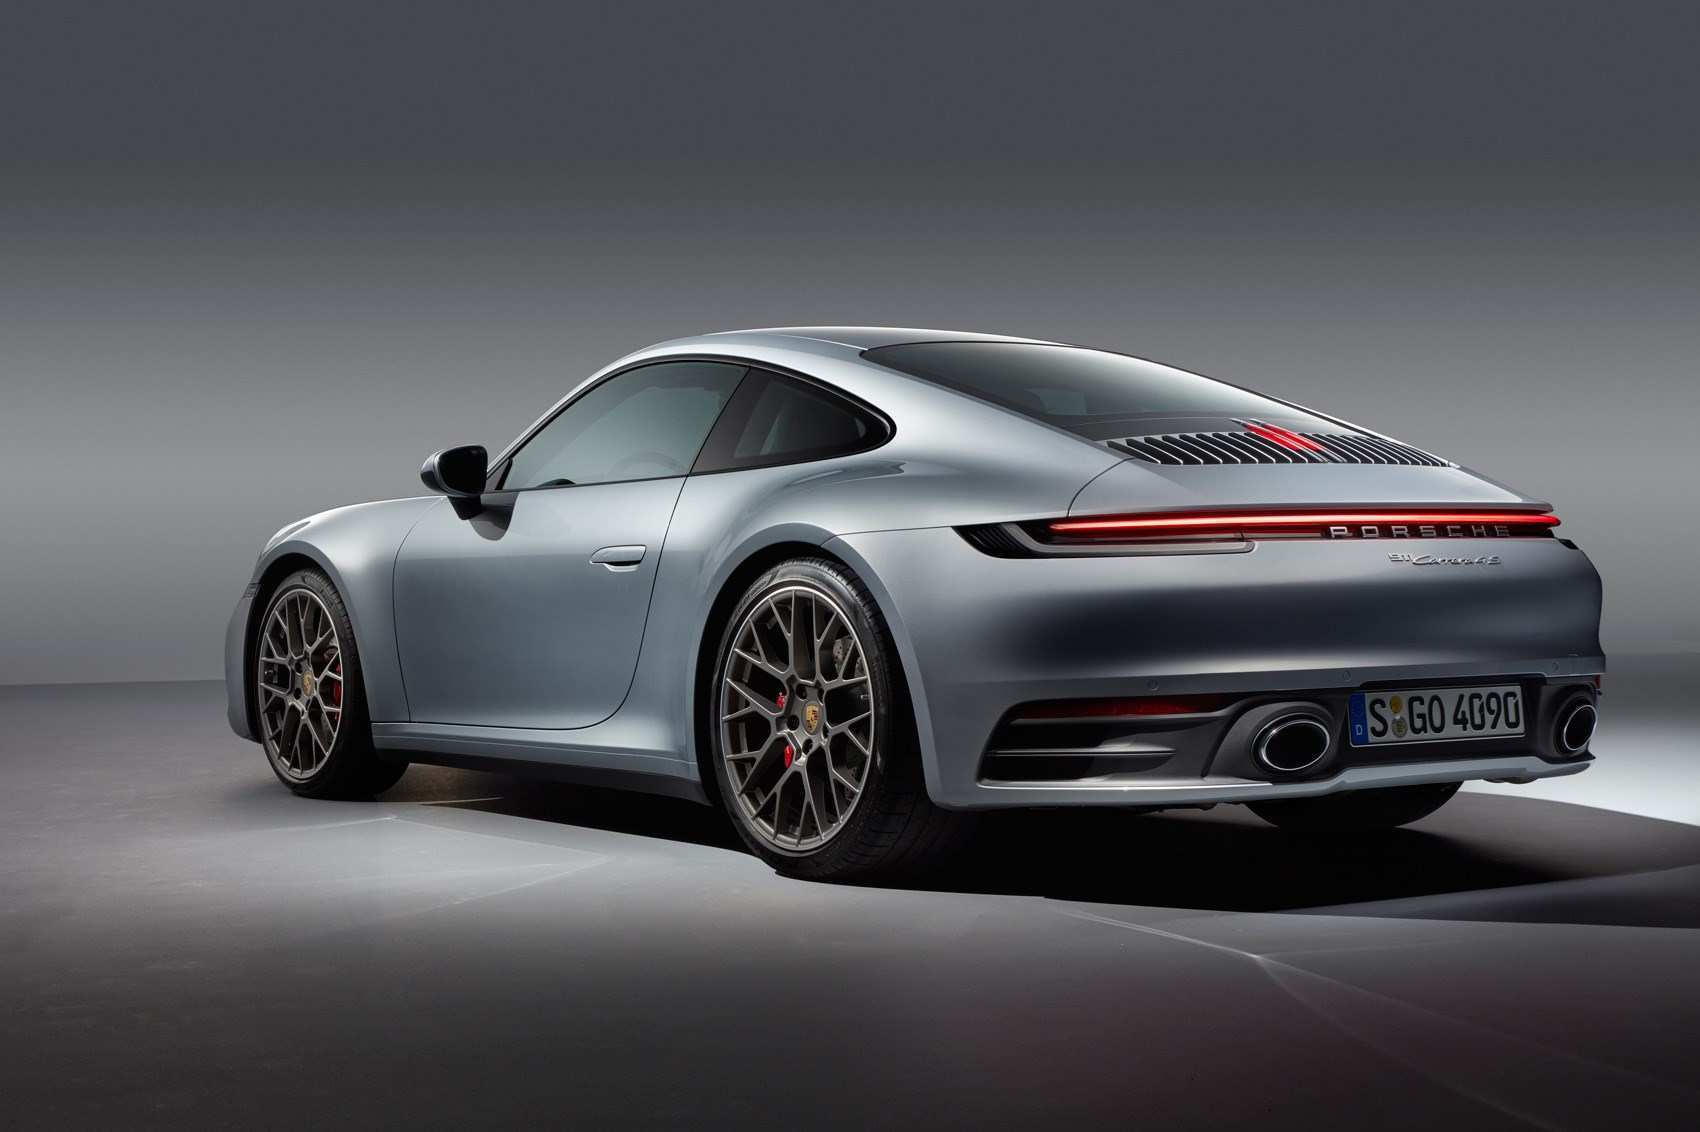 28 All New Porsche Modelle 2020 Release Date by Porsche Modelle 2020